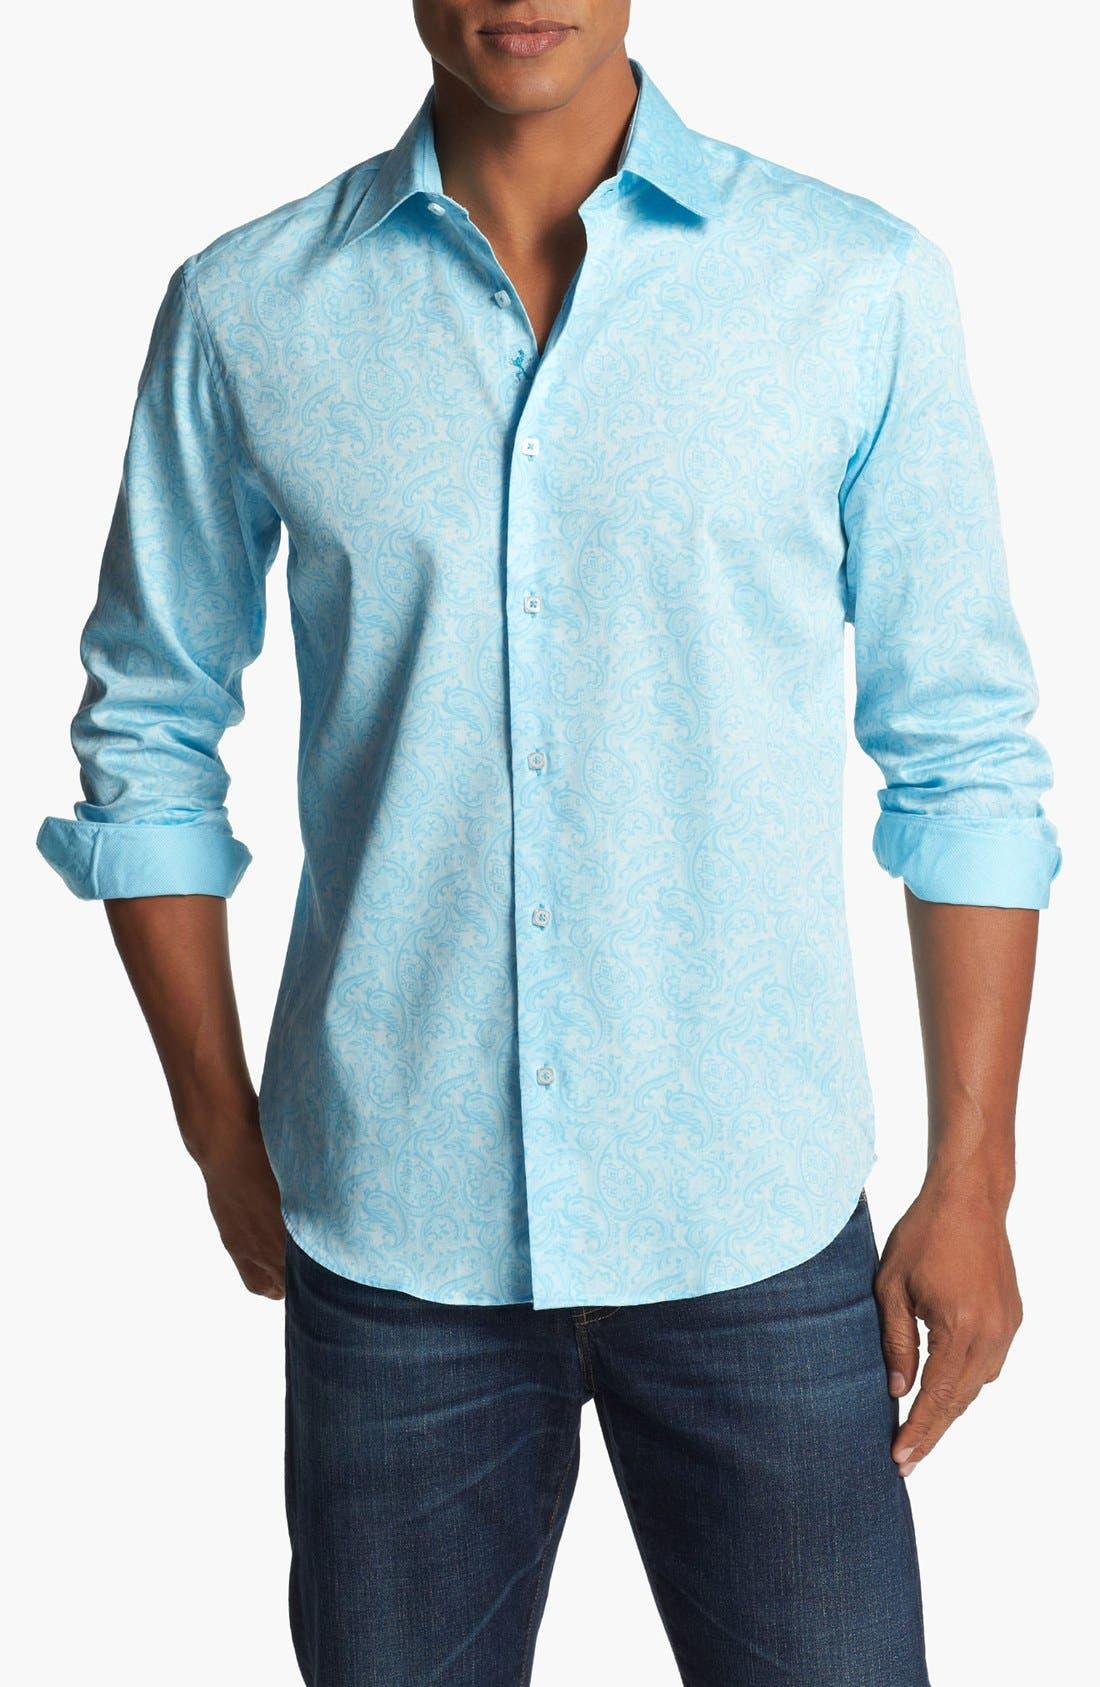 Alternate Image 1 Selected - Bugatchi Paisley Shaped Fit Cotton Sport Shirt